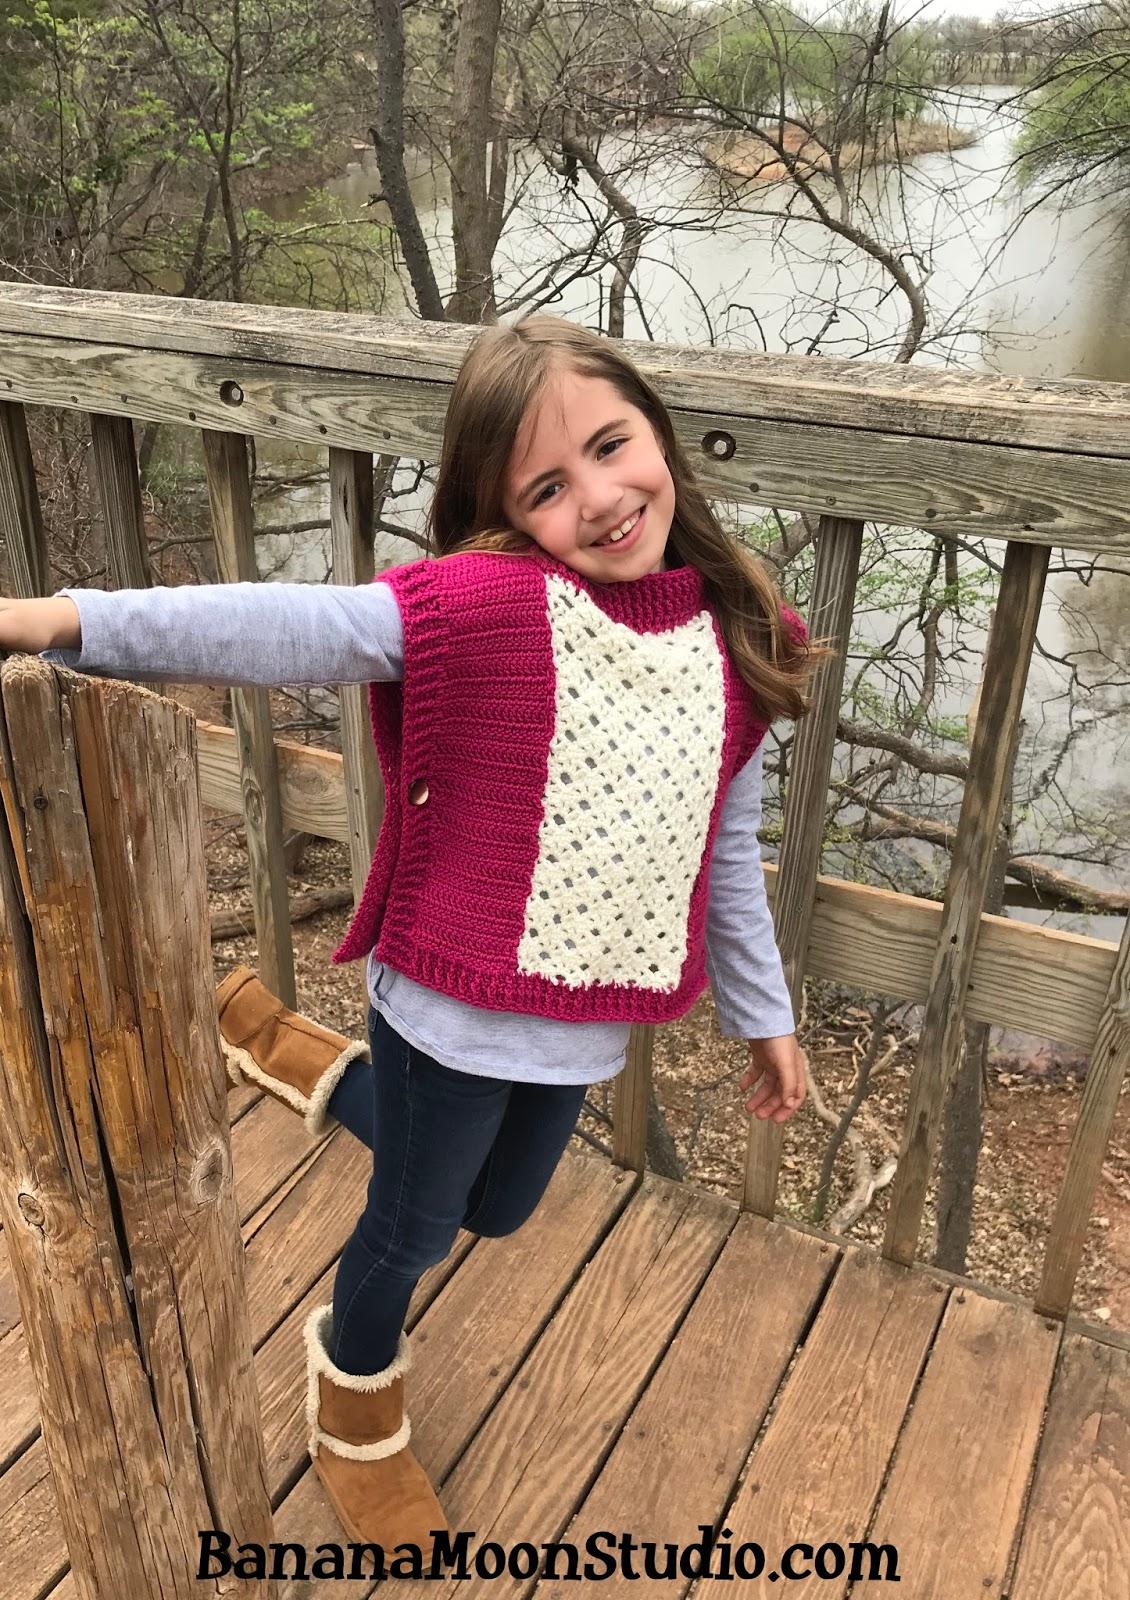 Banana Moon Studio : Free Crochet Pattern for a Girls Poncho ...